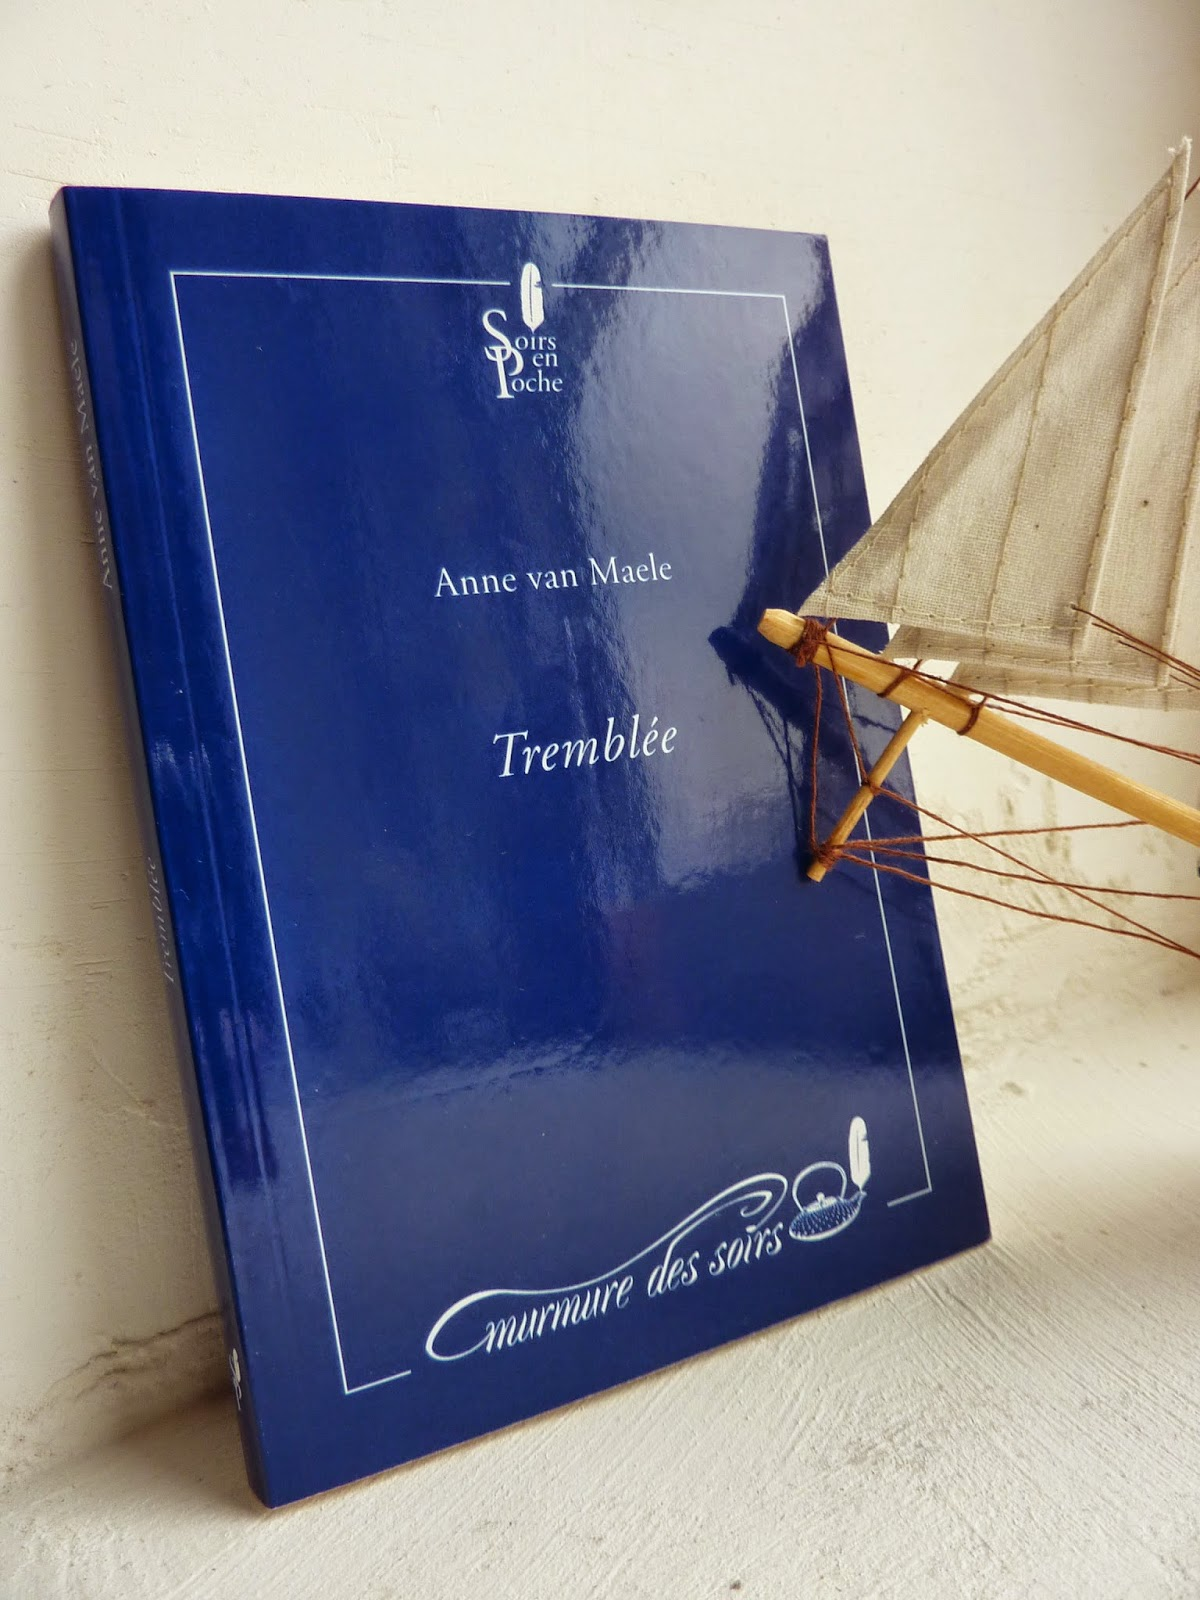 Tremblée - Anne van Maele